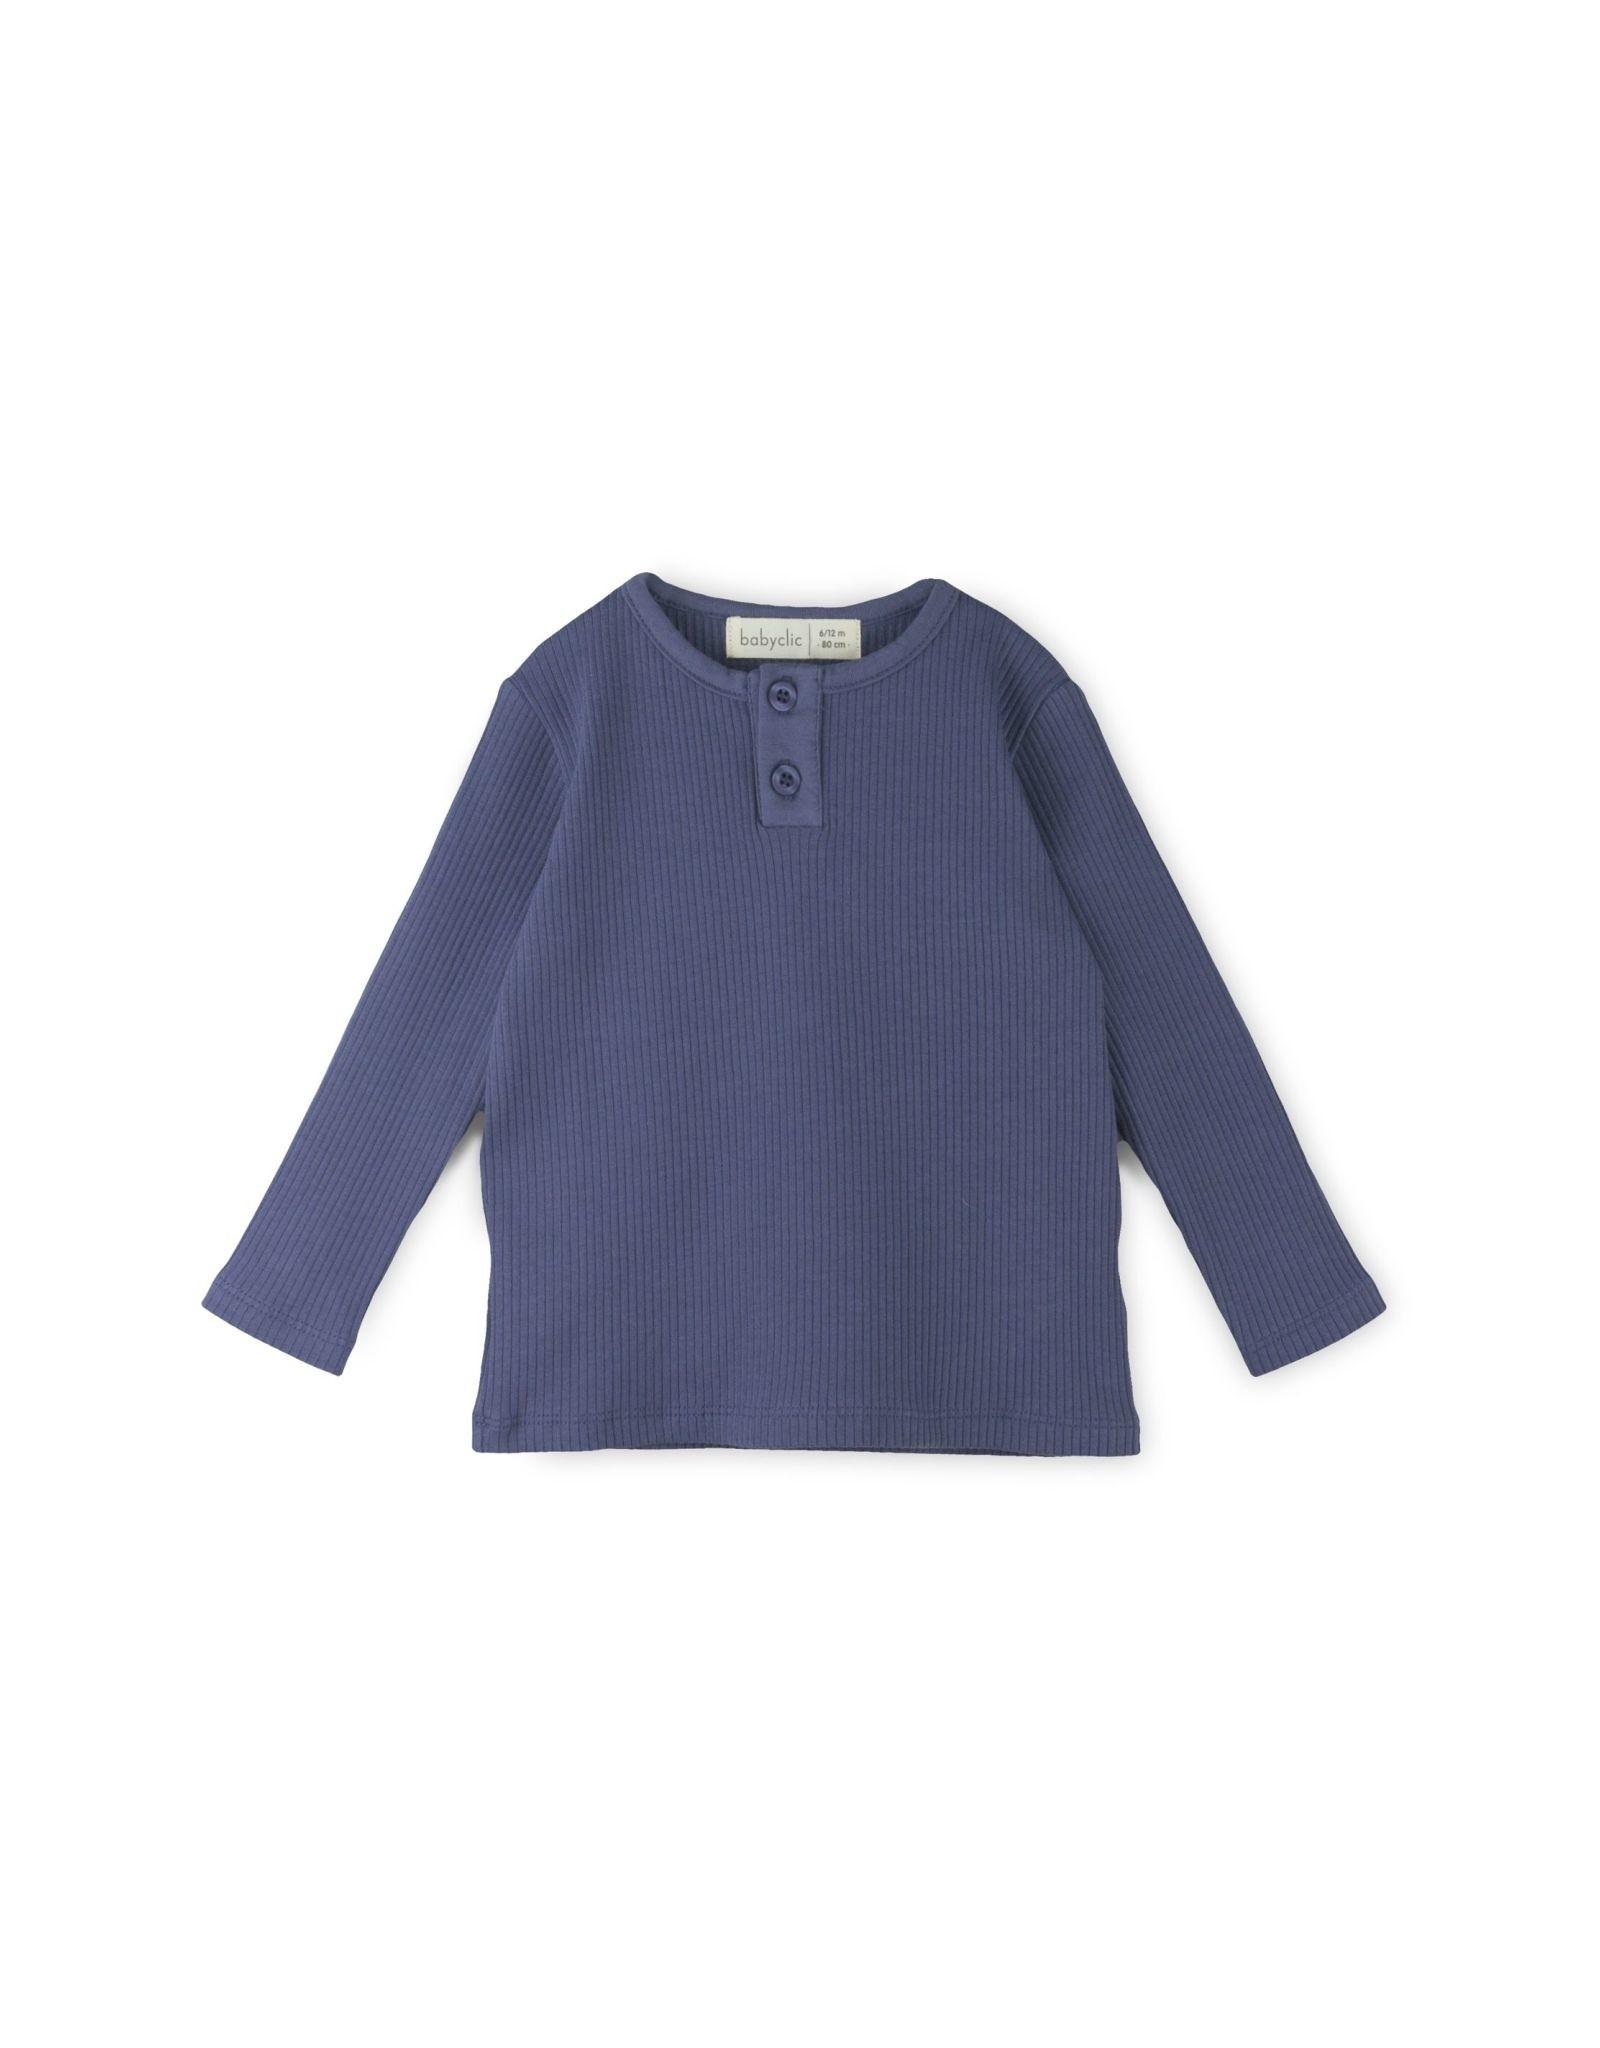 BabyClic rib t-shirt- colbalt